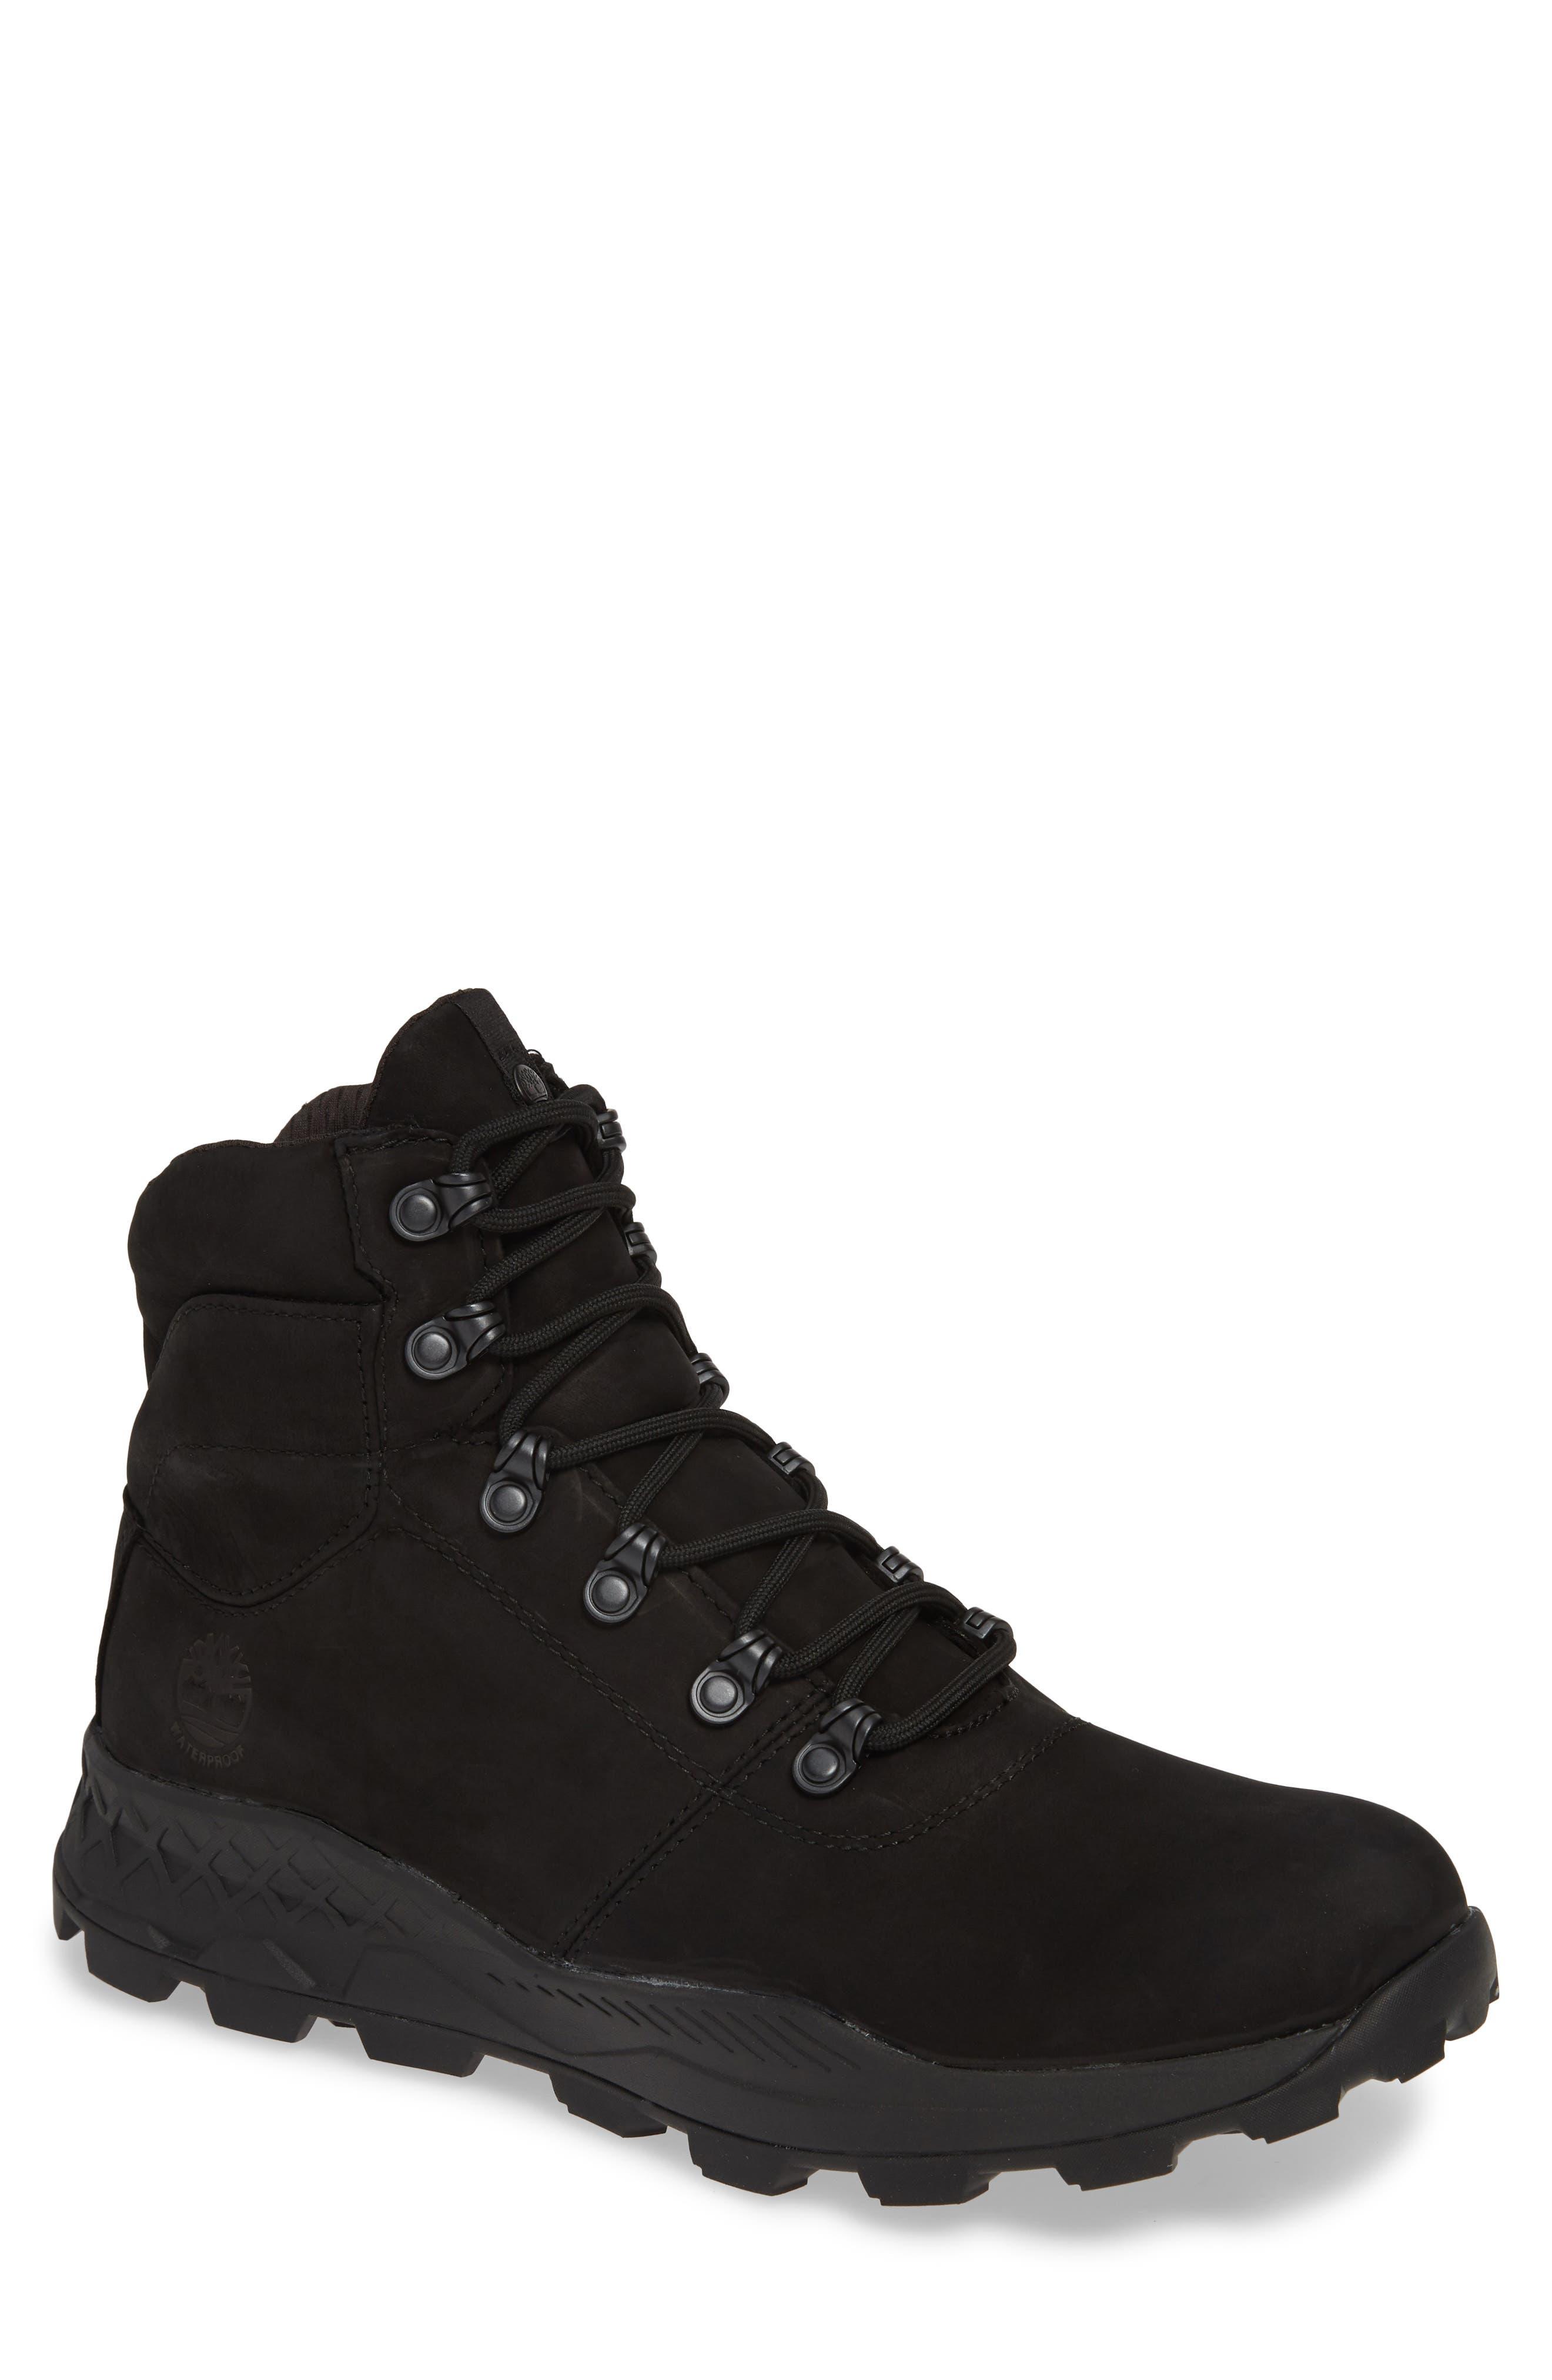 Timberland Brooklyn Waterproof Boot, Black